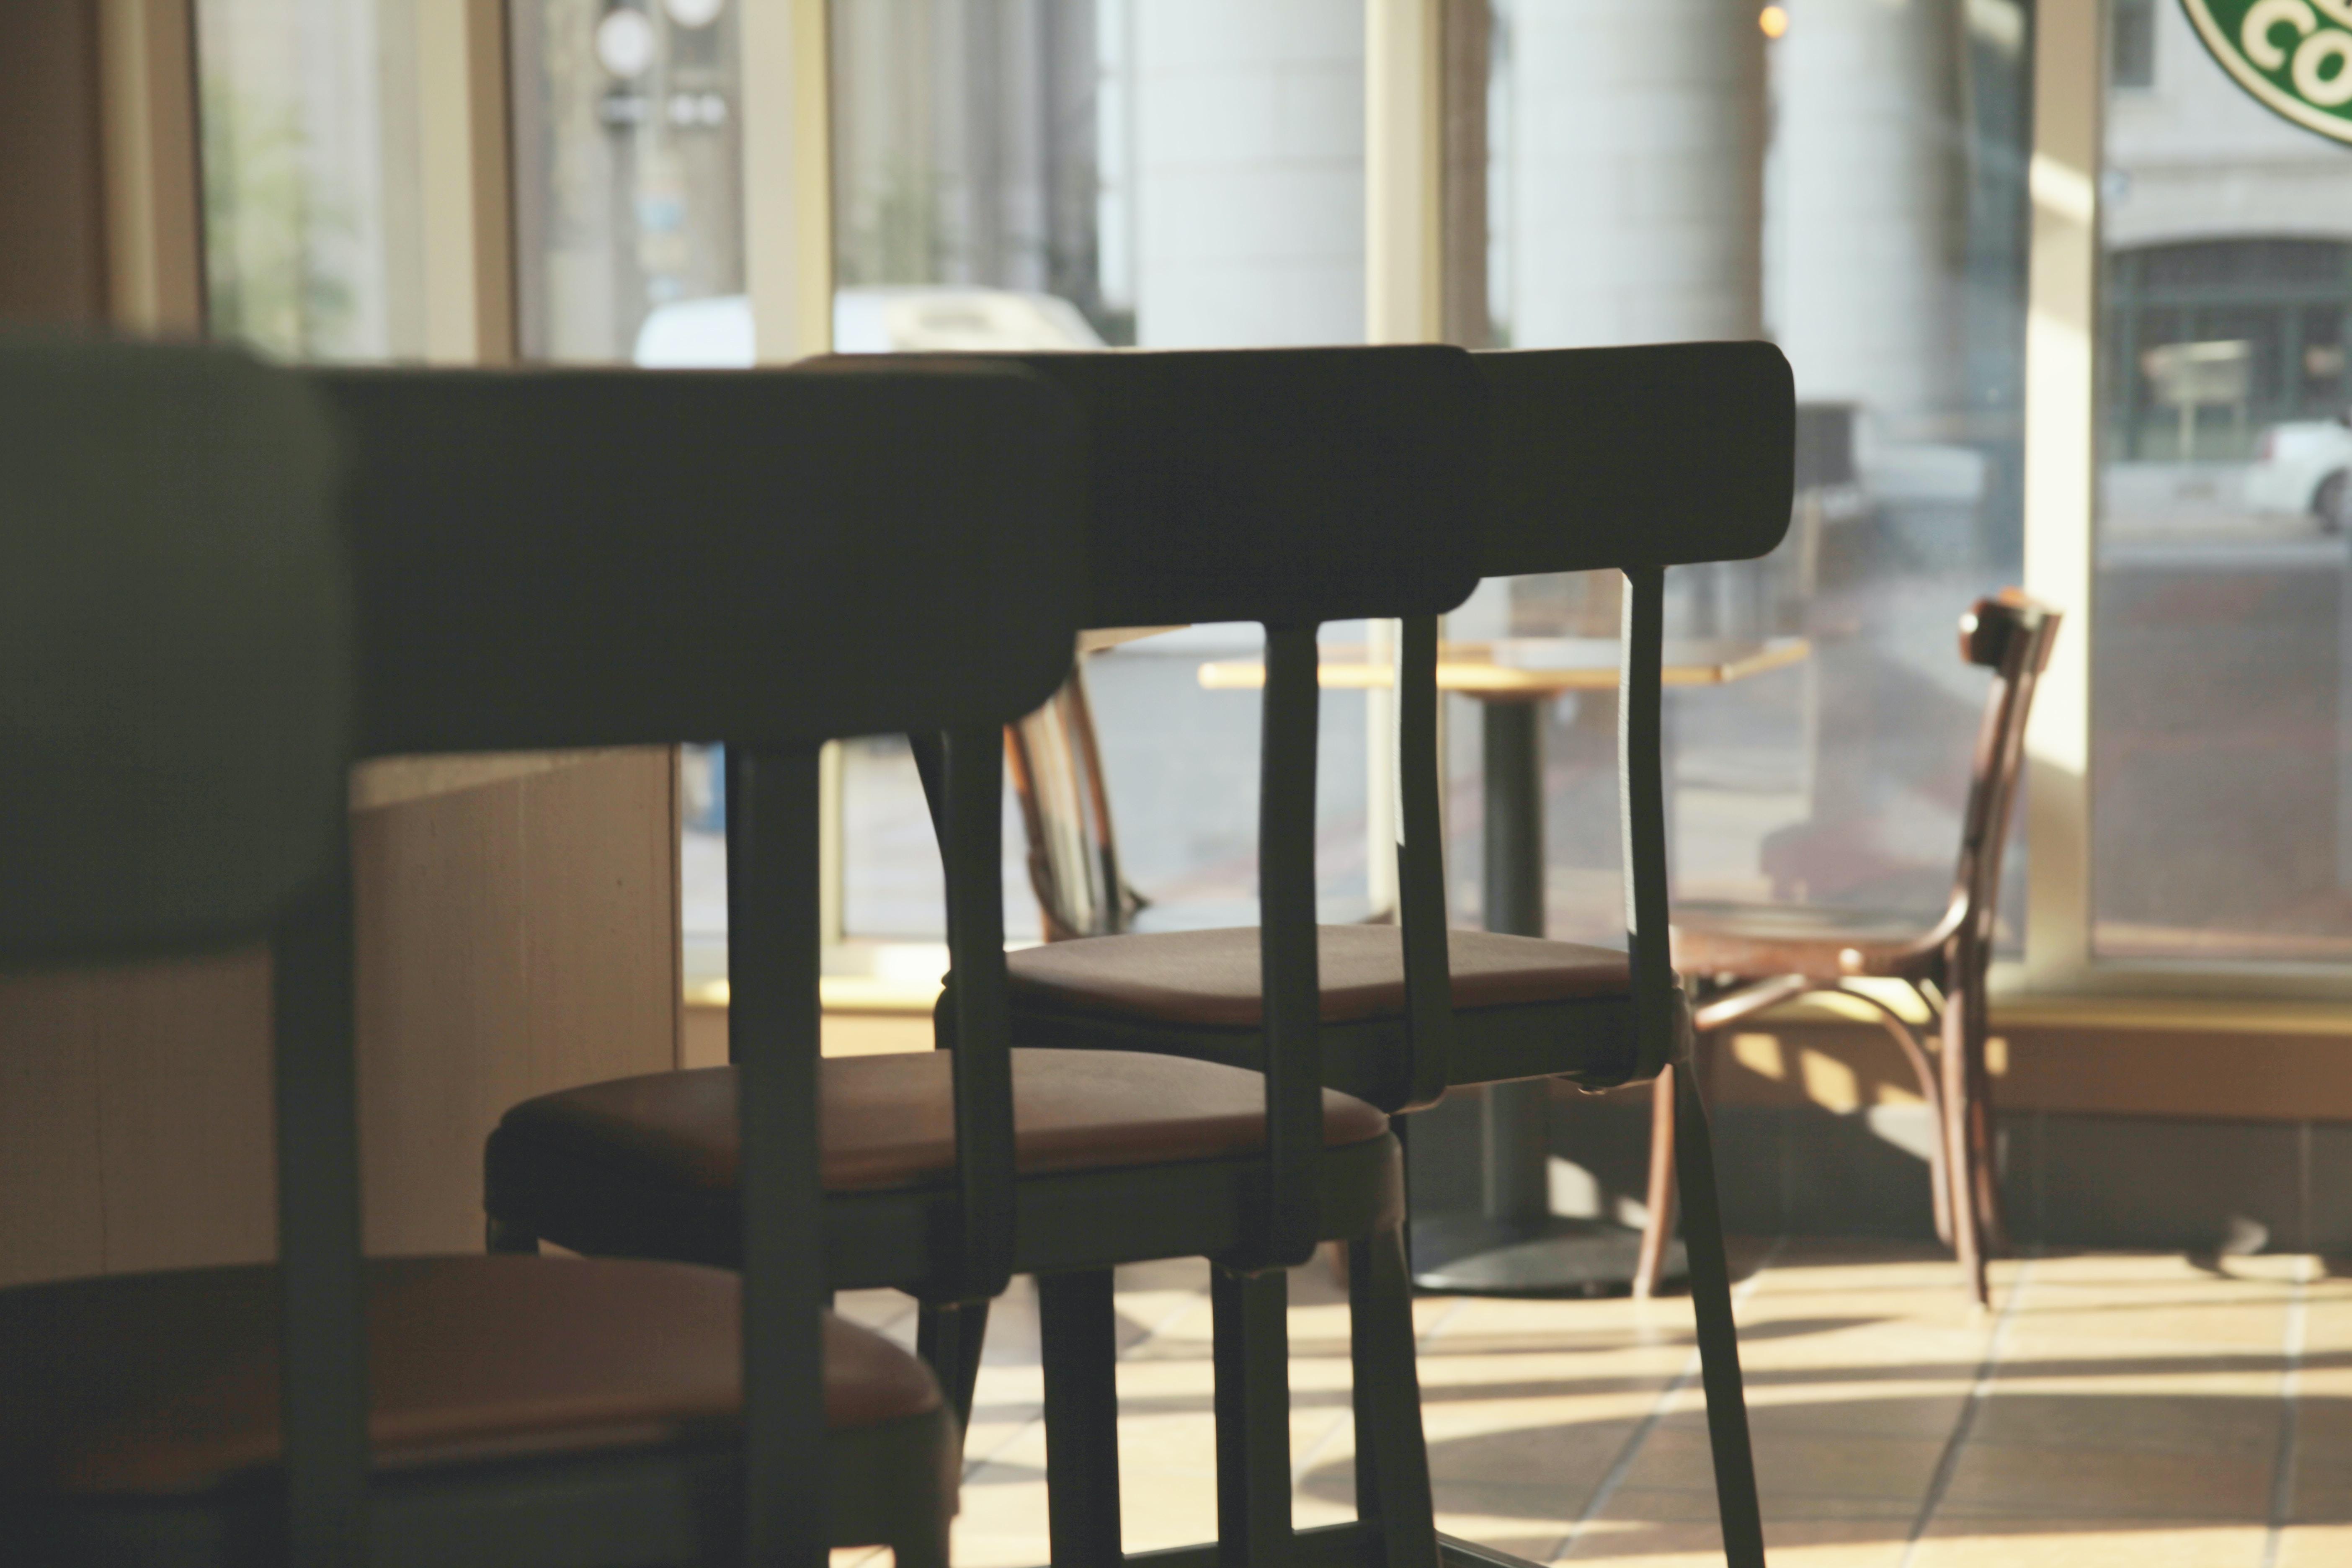 The sun coming through the window at Starbucks